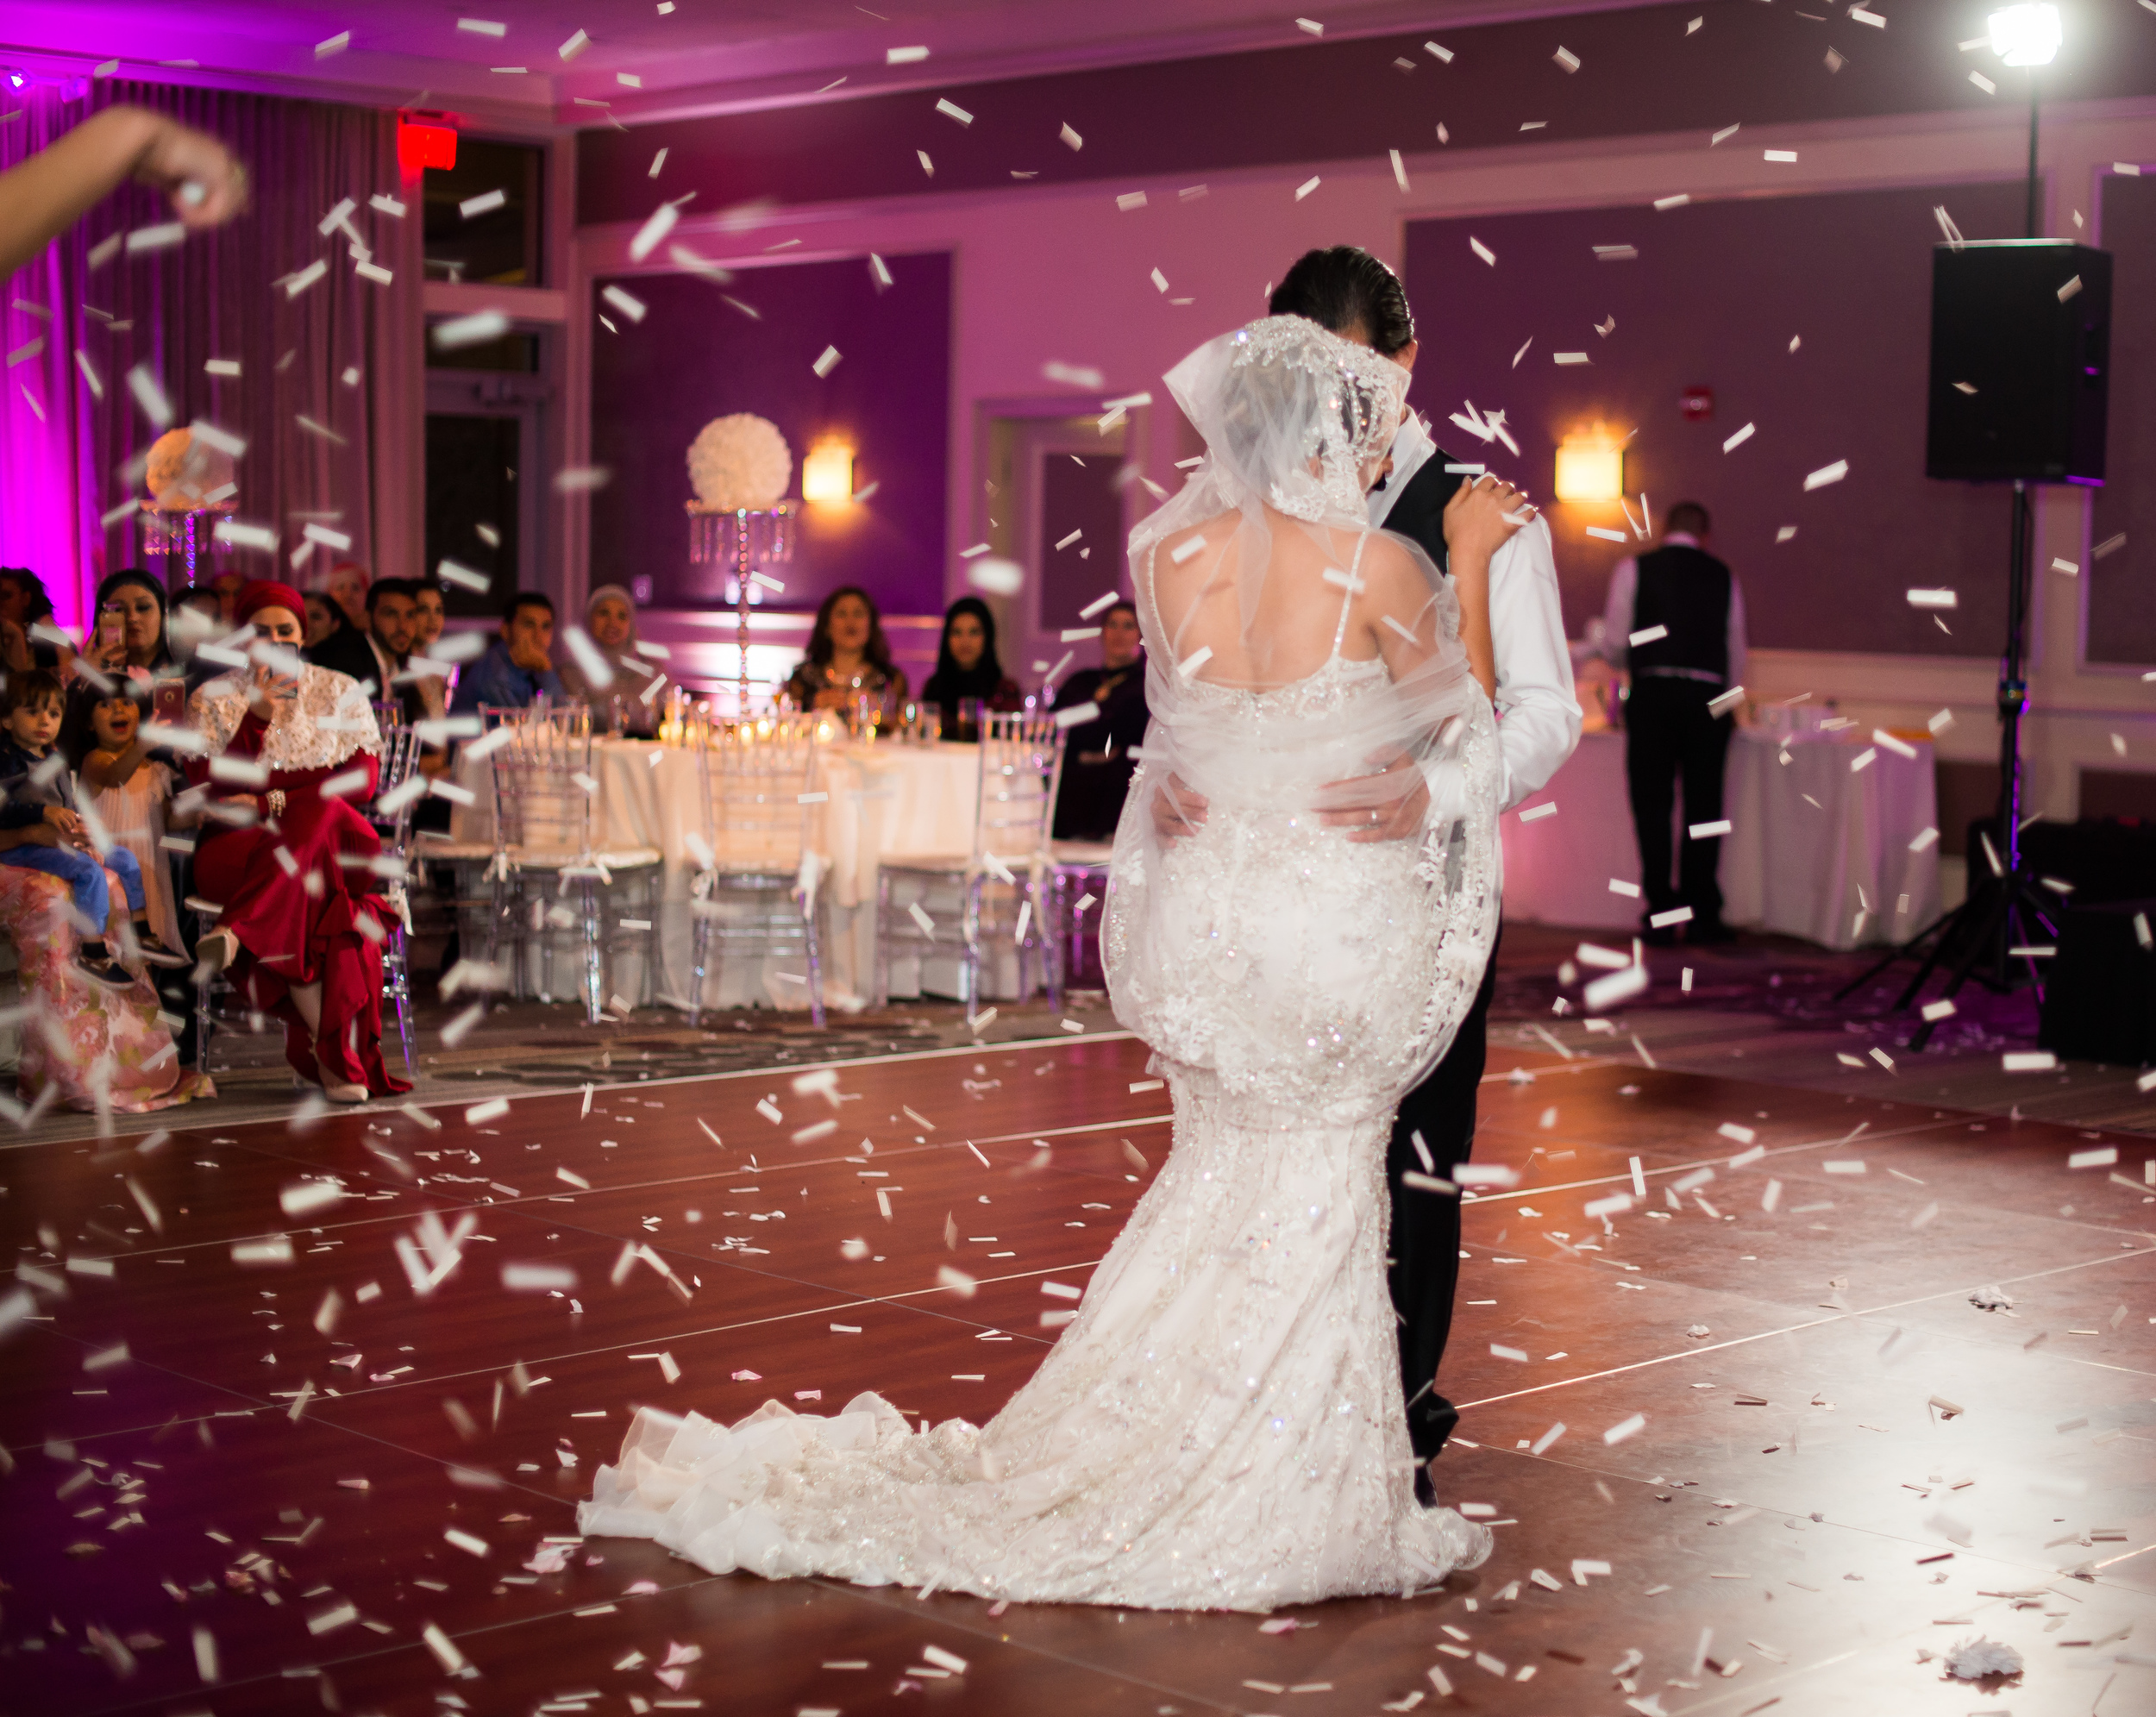 Suzannes & Omar's Wedding | Highlights-0094.jpg